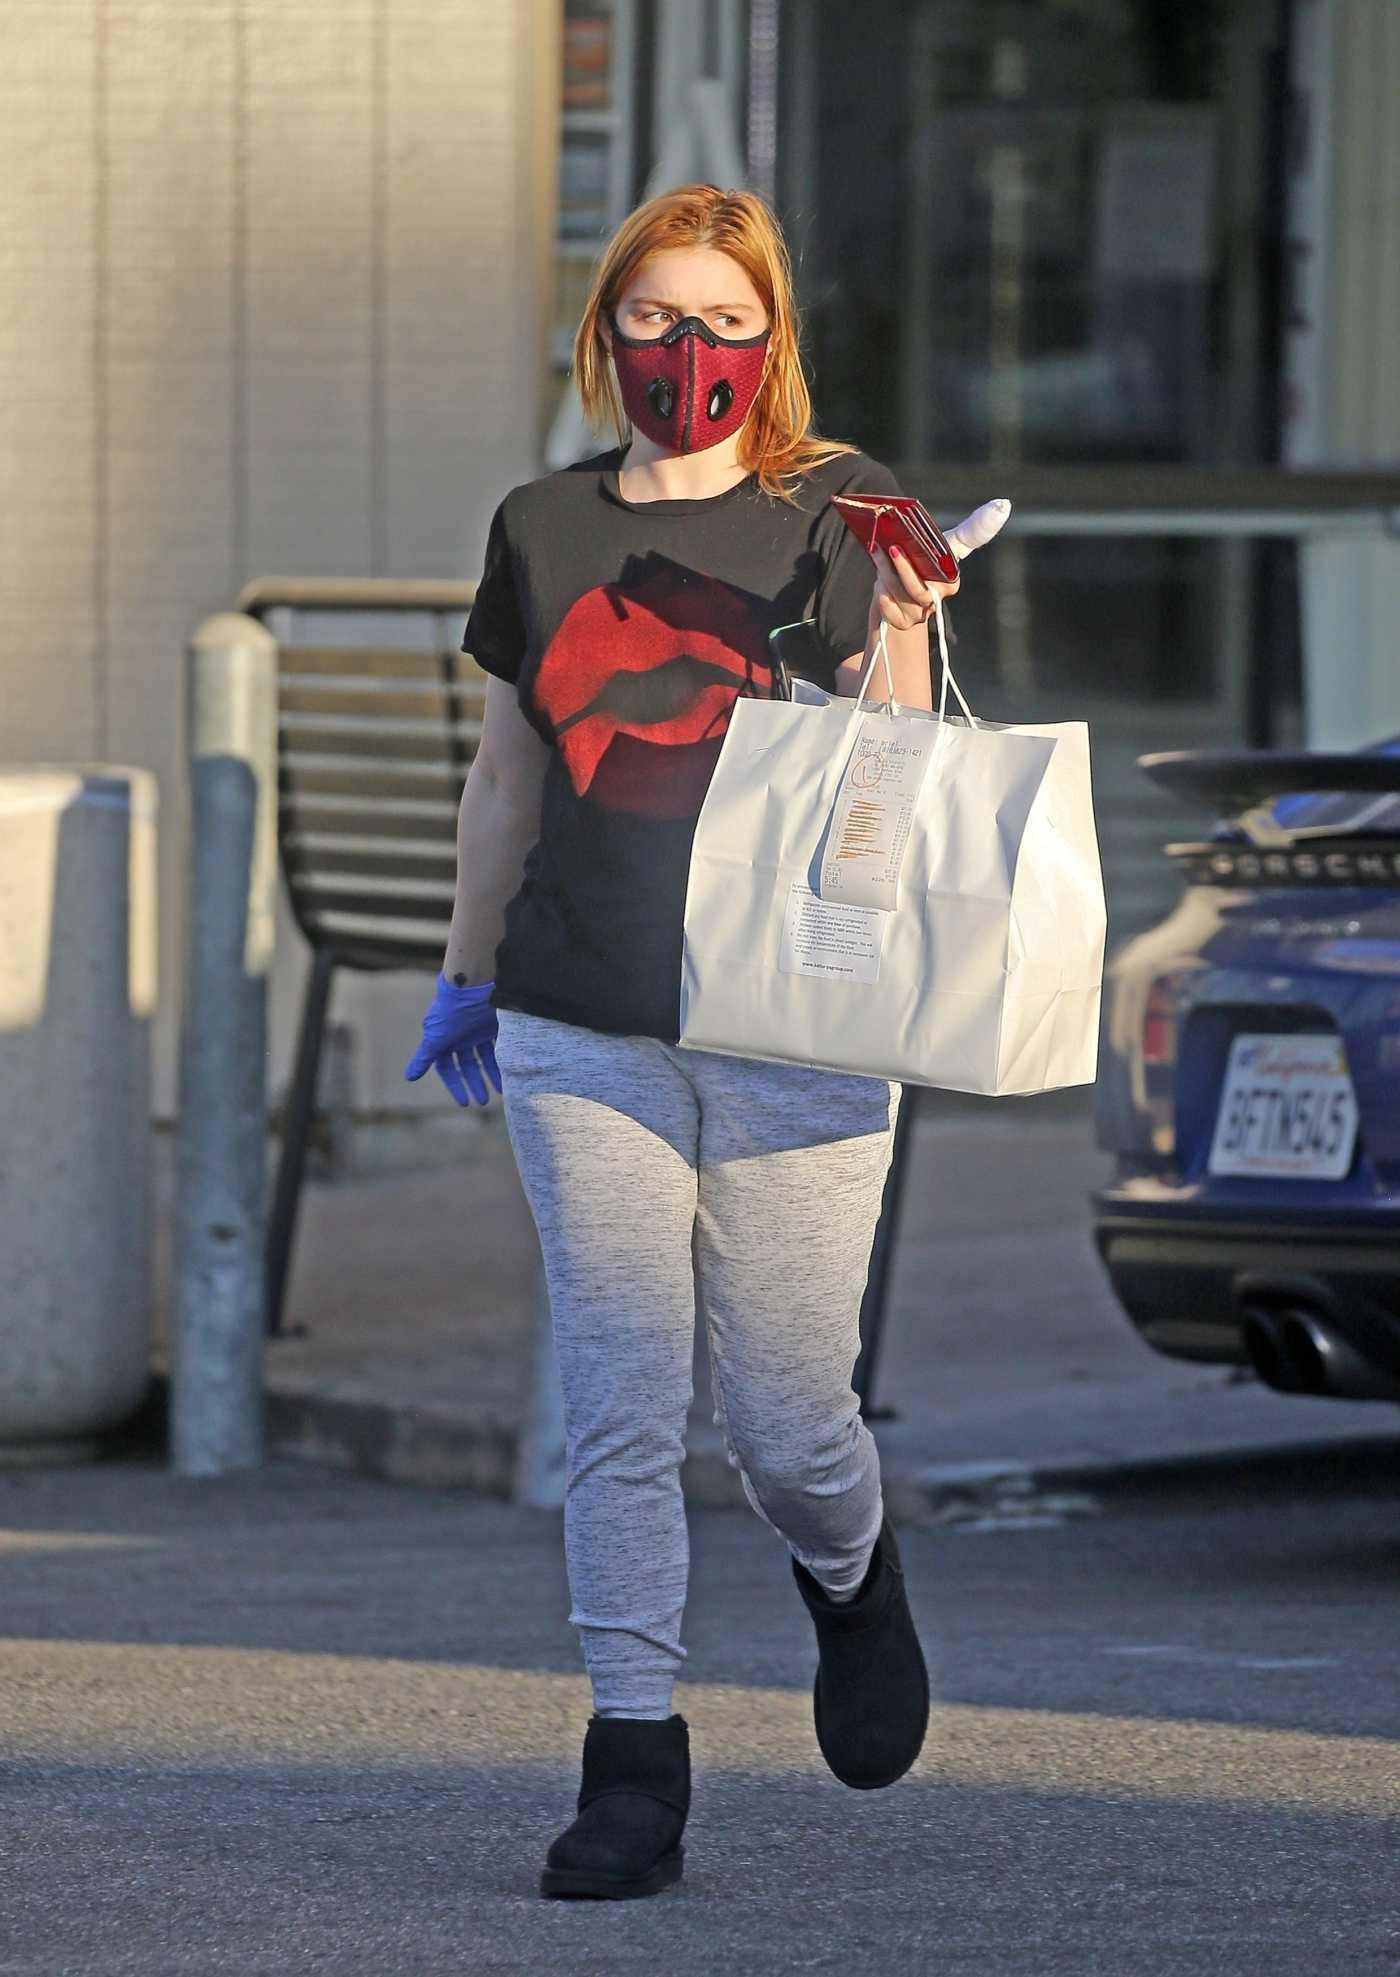 Ariel Winter in a Black Tee Goes Shopping in Studio City 05/01/2020